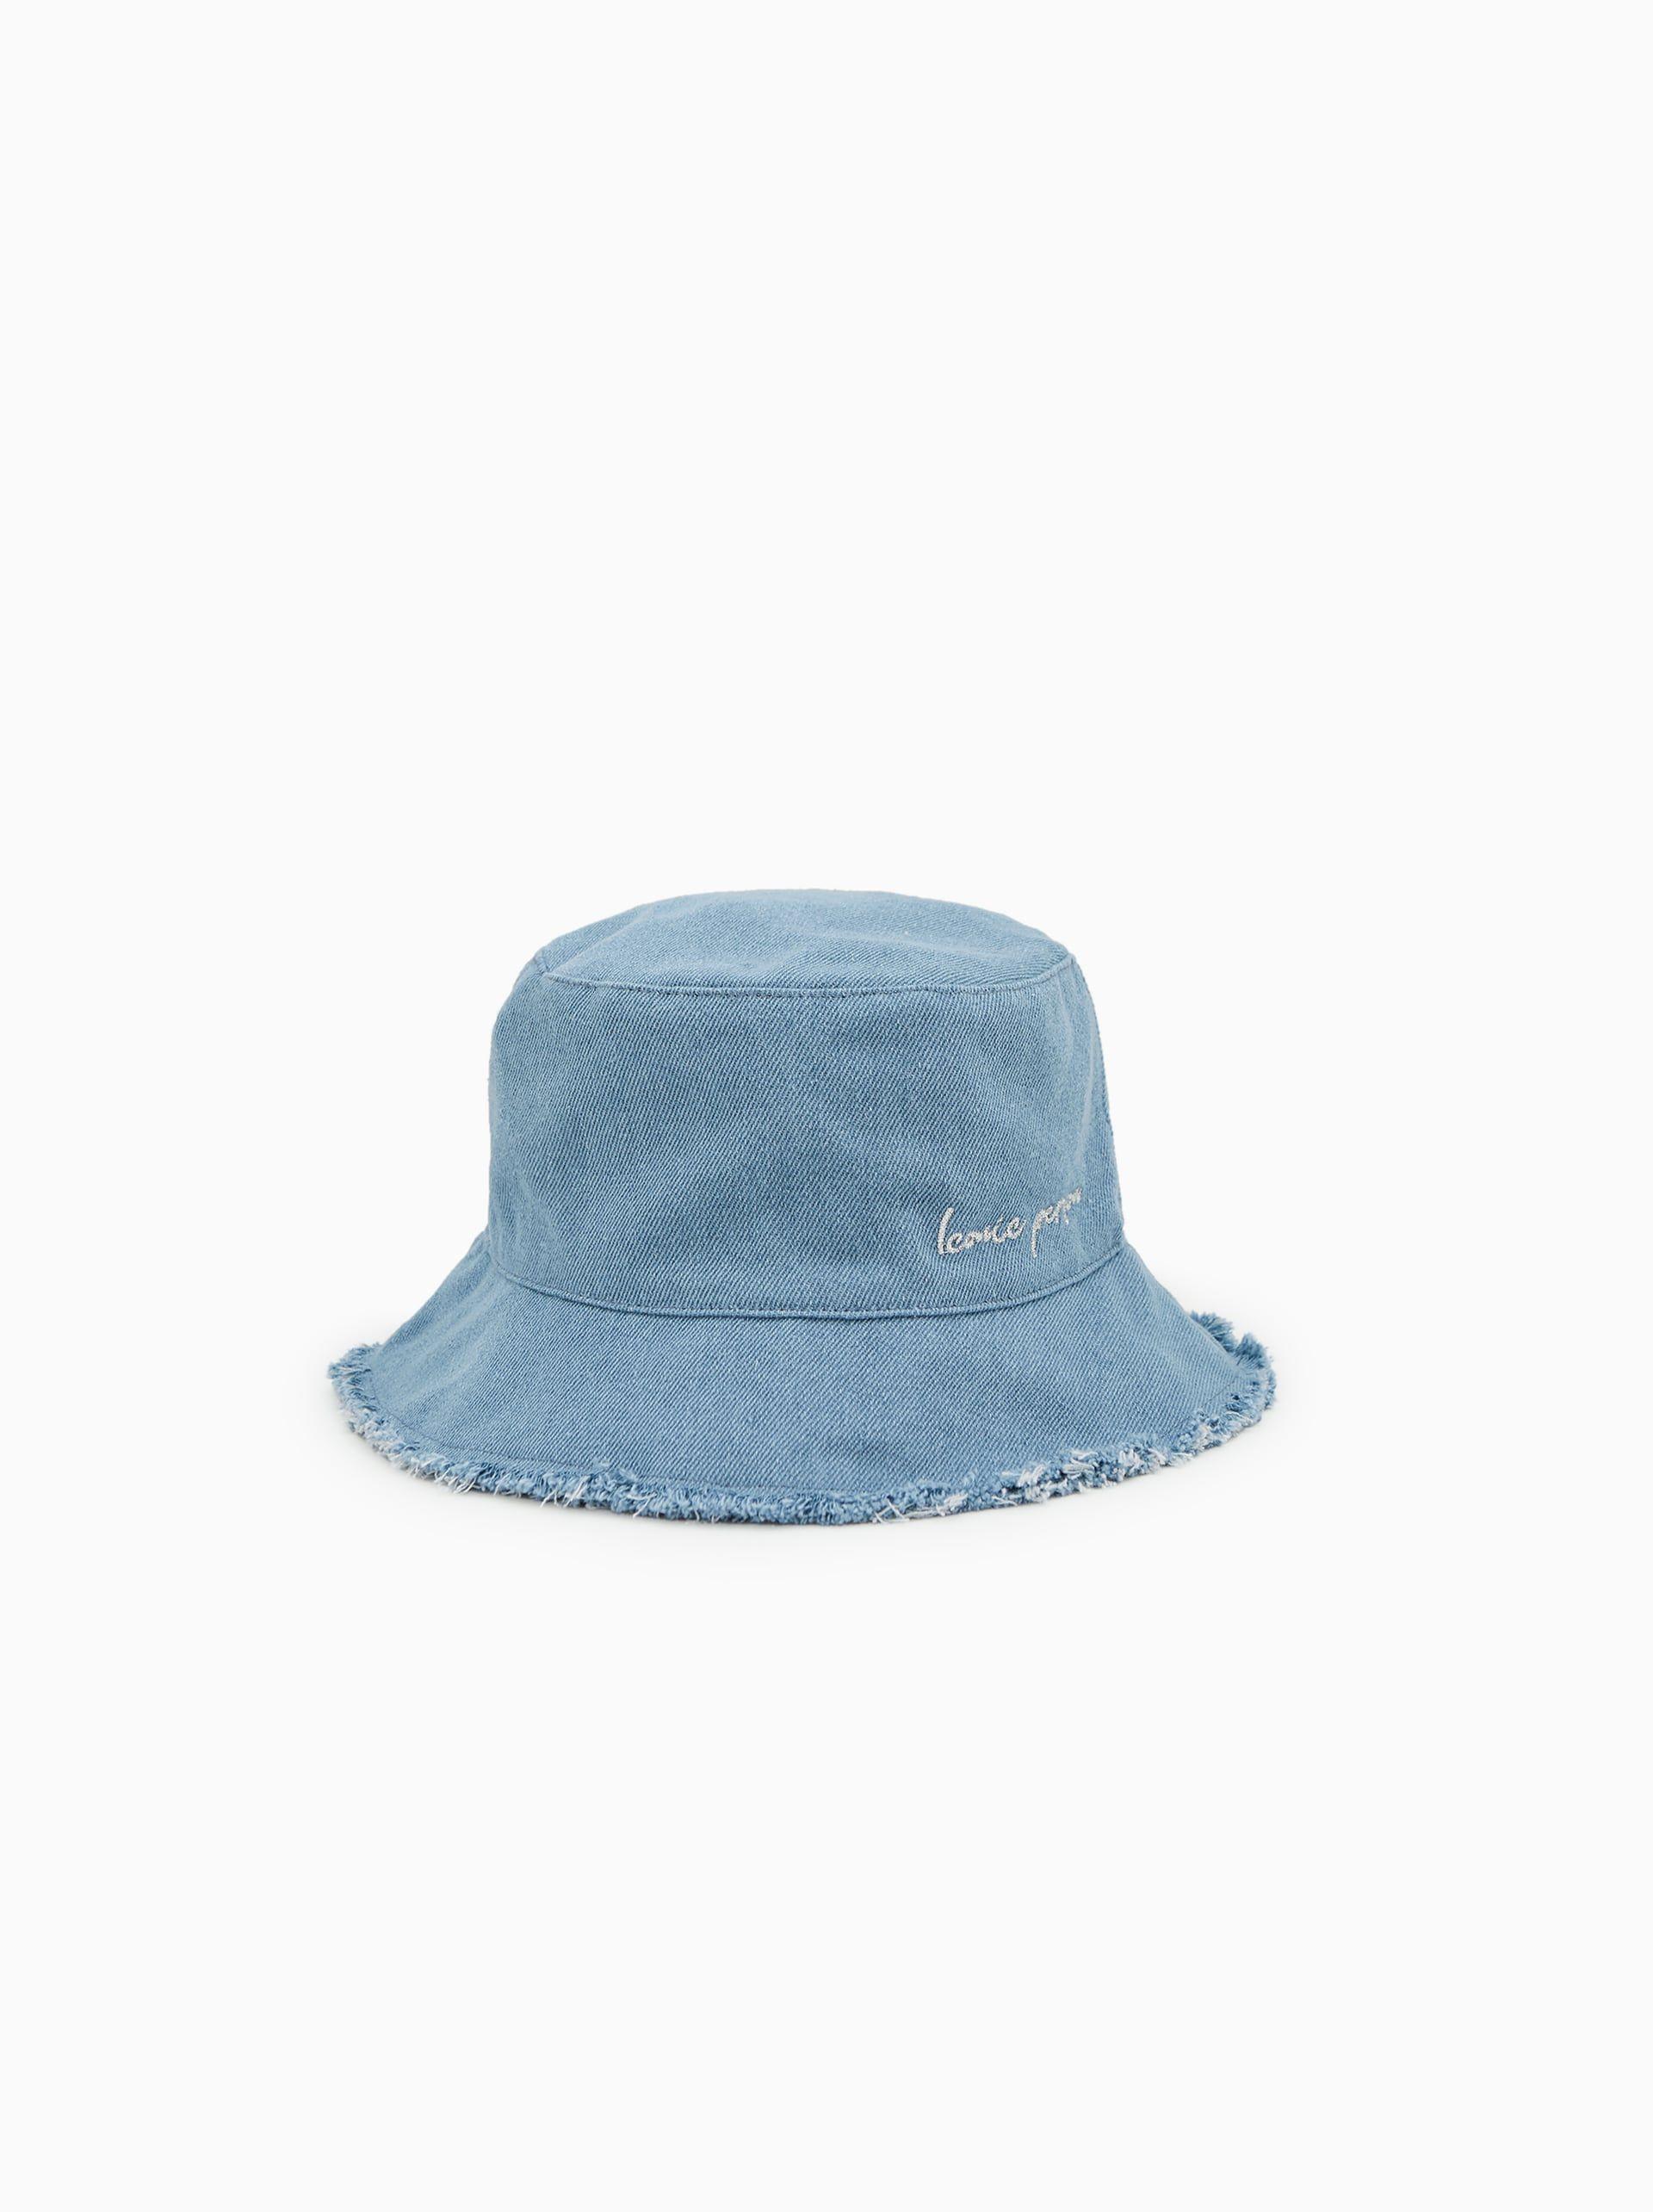 a61fec78 Frayed denim hat in 2019   Kids Hat   Denim hat, Kids hats, Baby hats